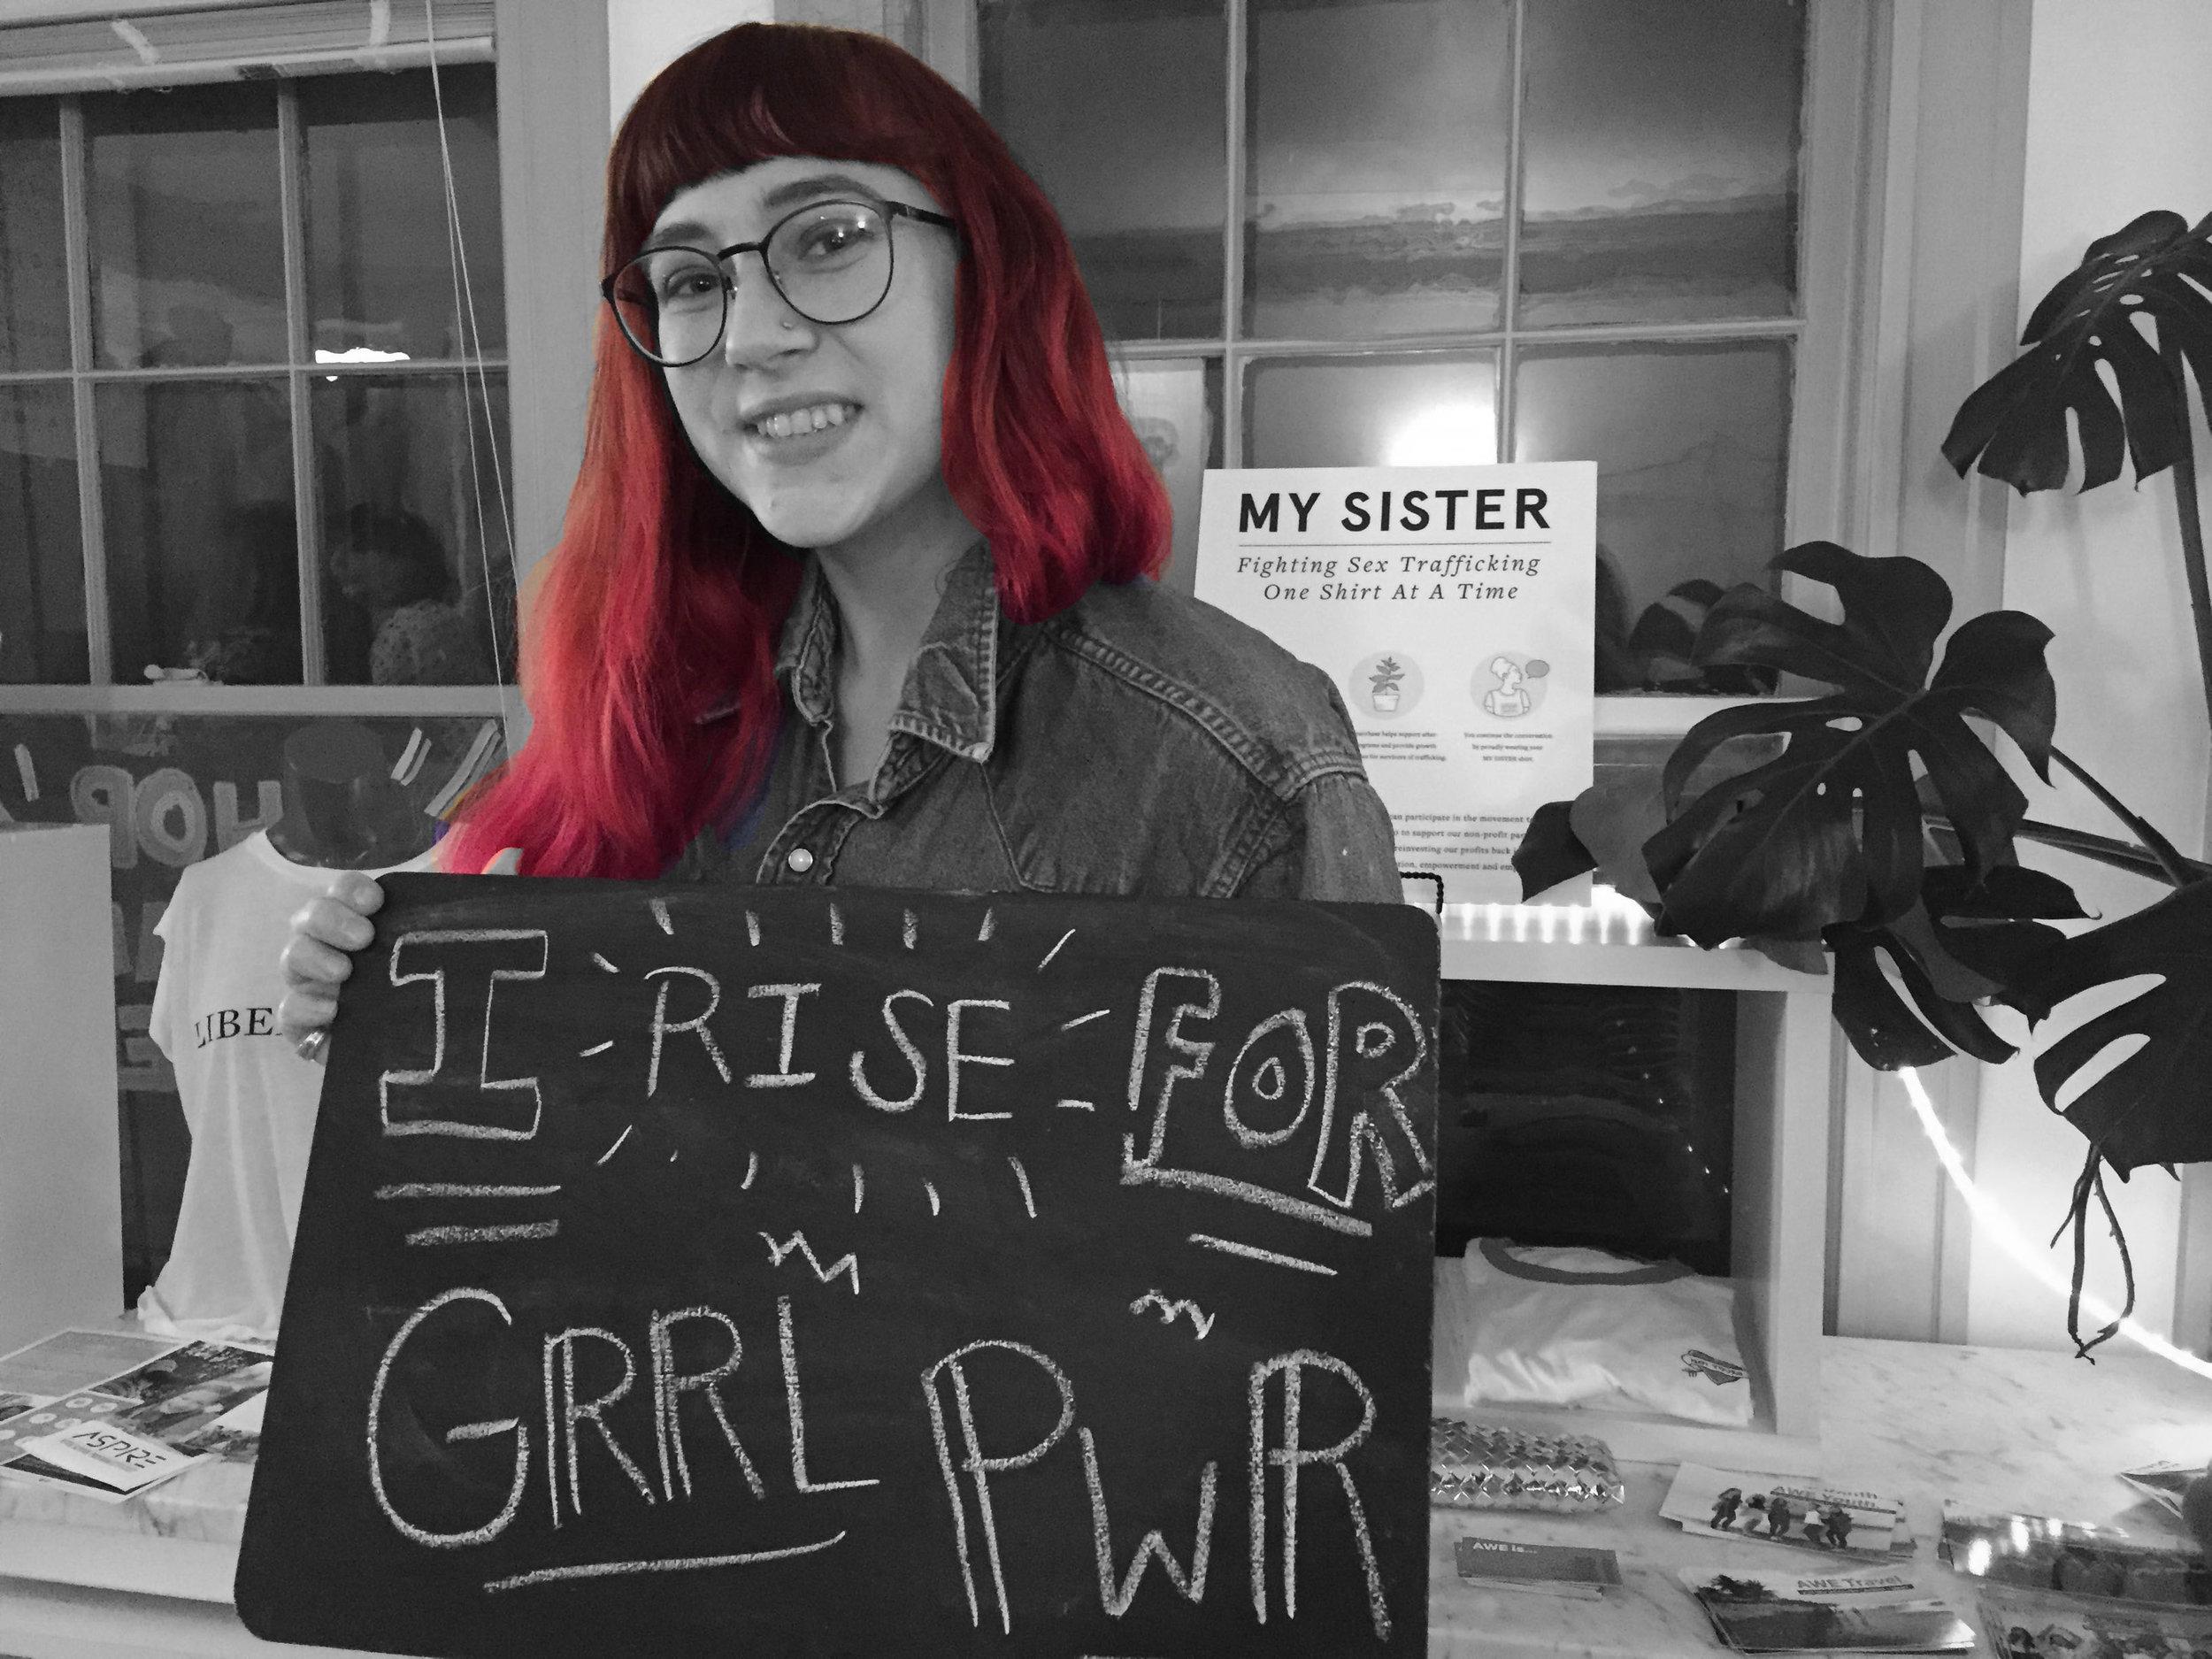 awe-women-empowerment-Amanda-Grl-Pwr.jpg